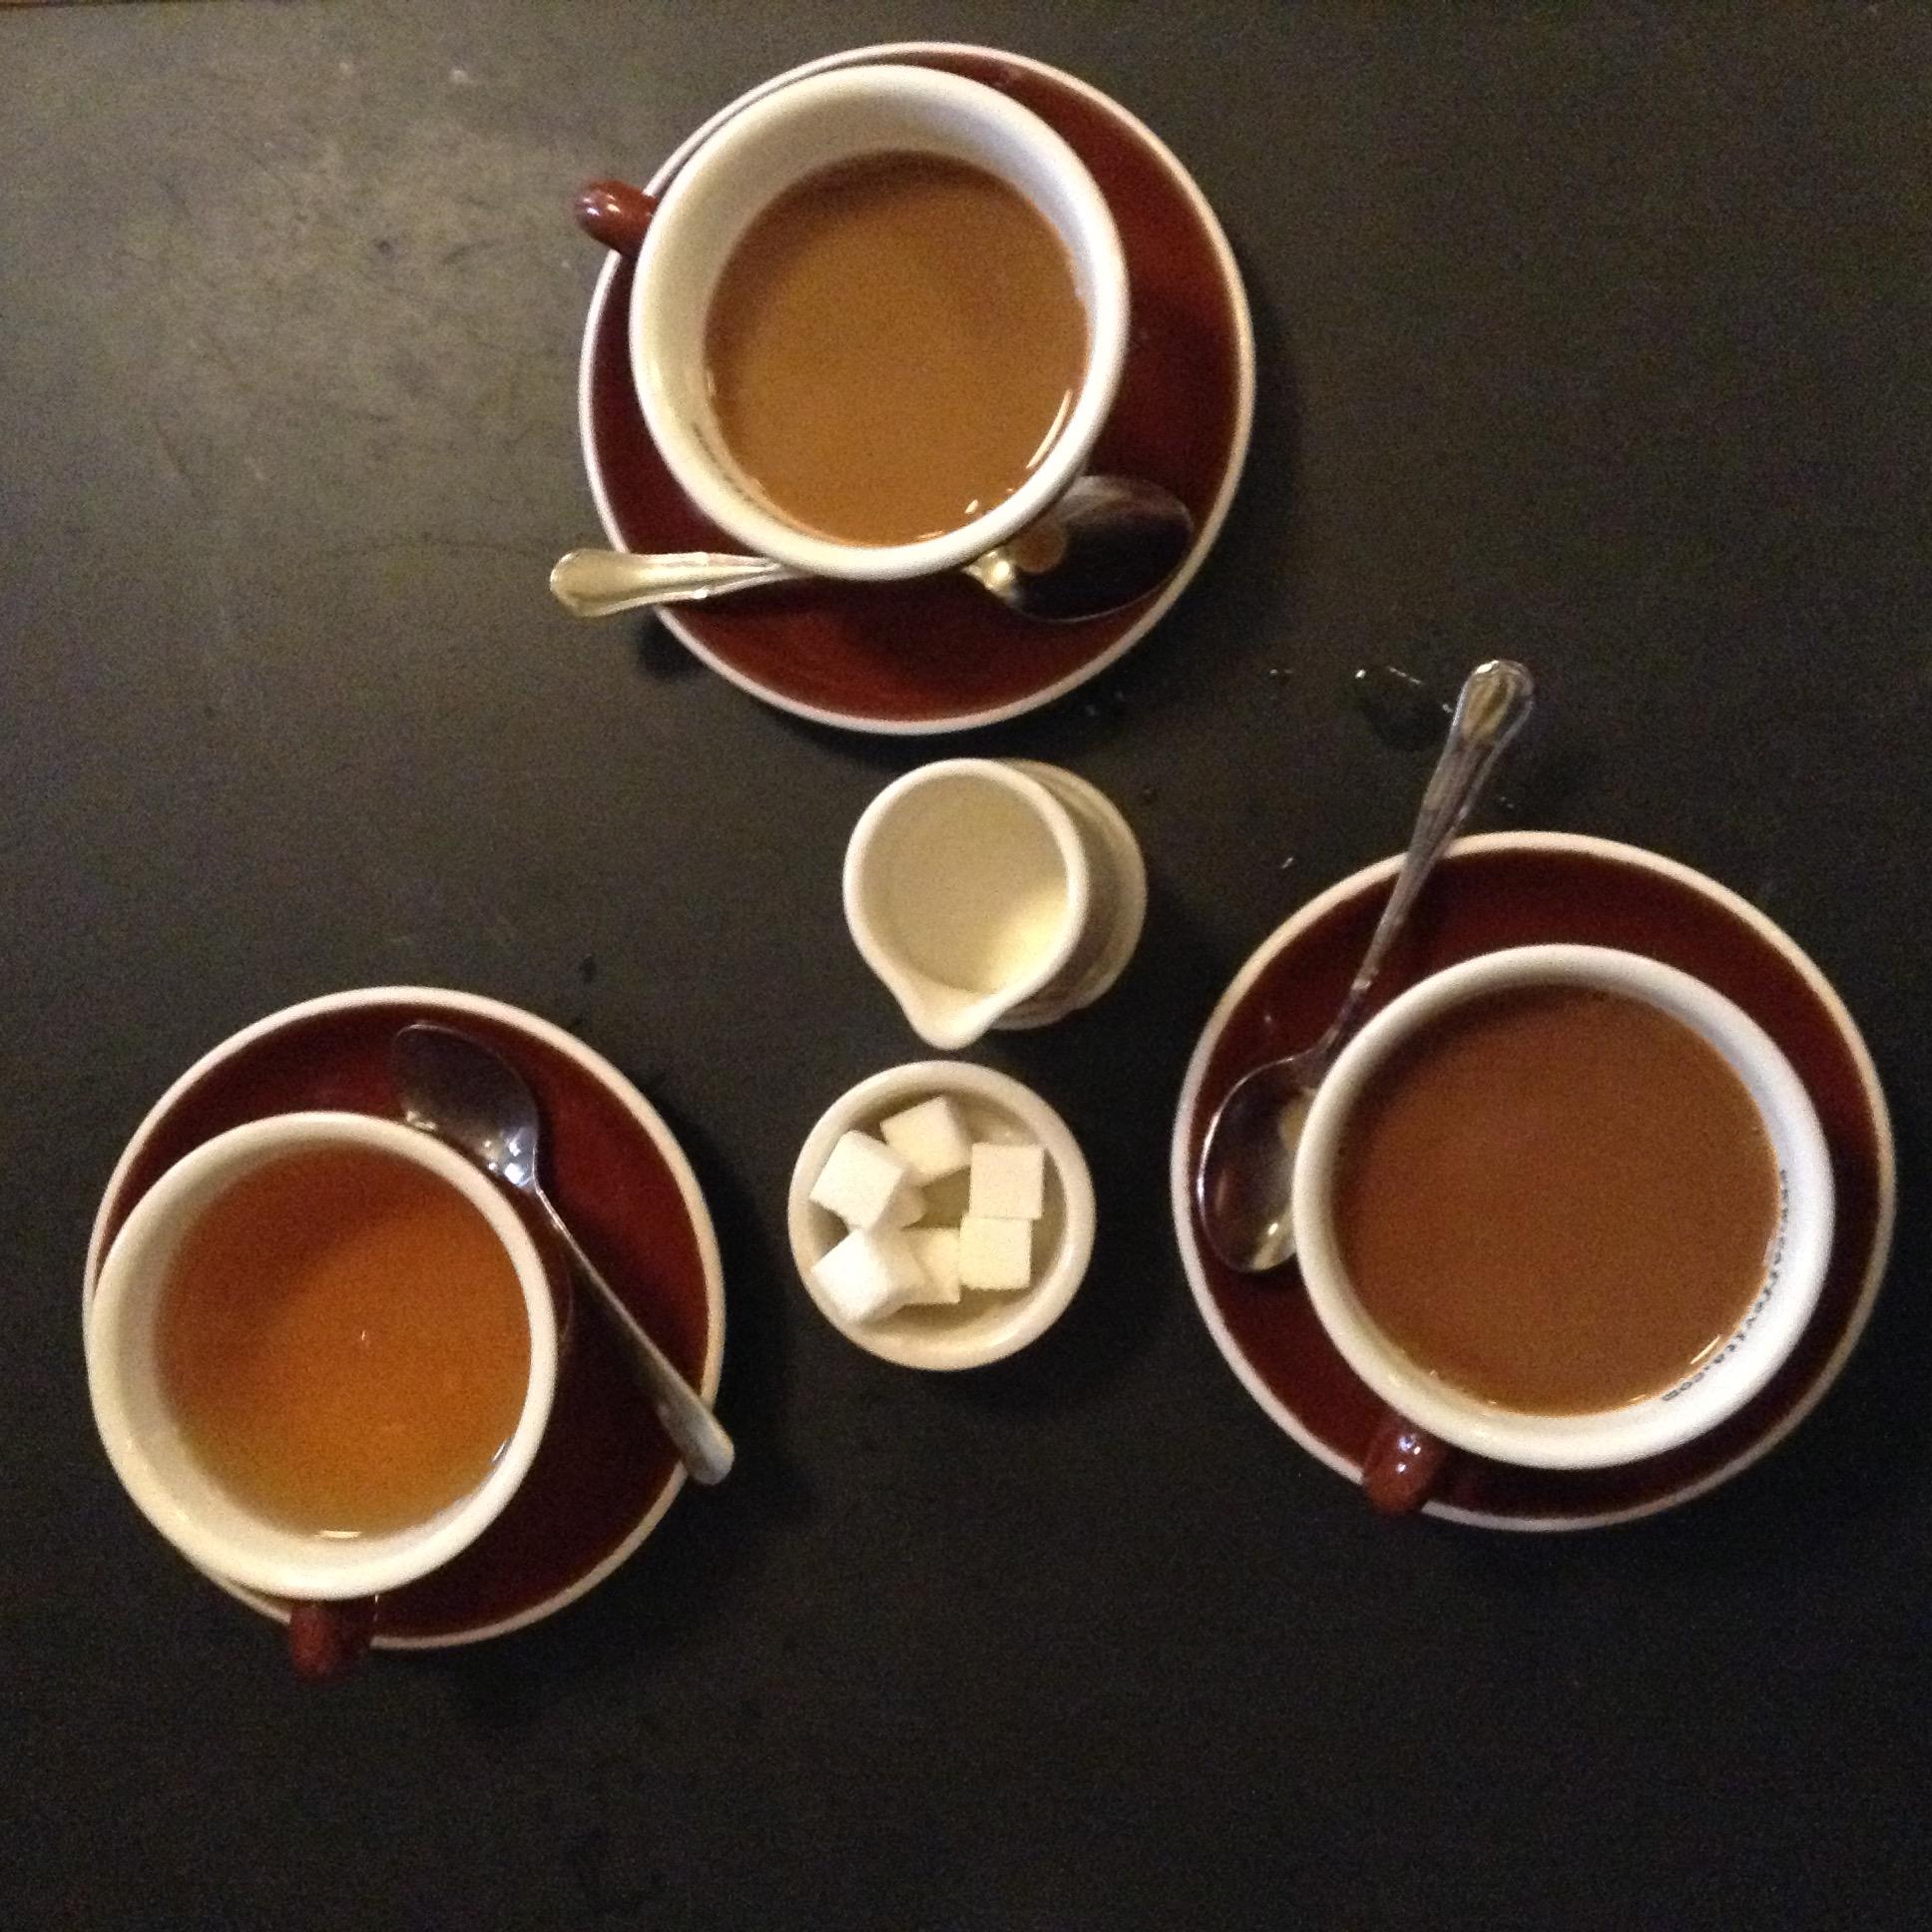 Coffee and tea at Le Pichet